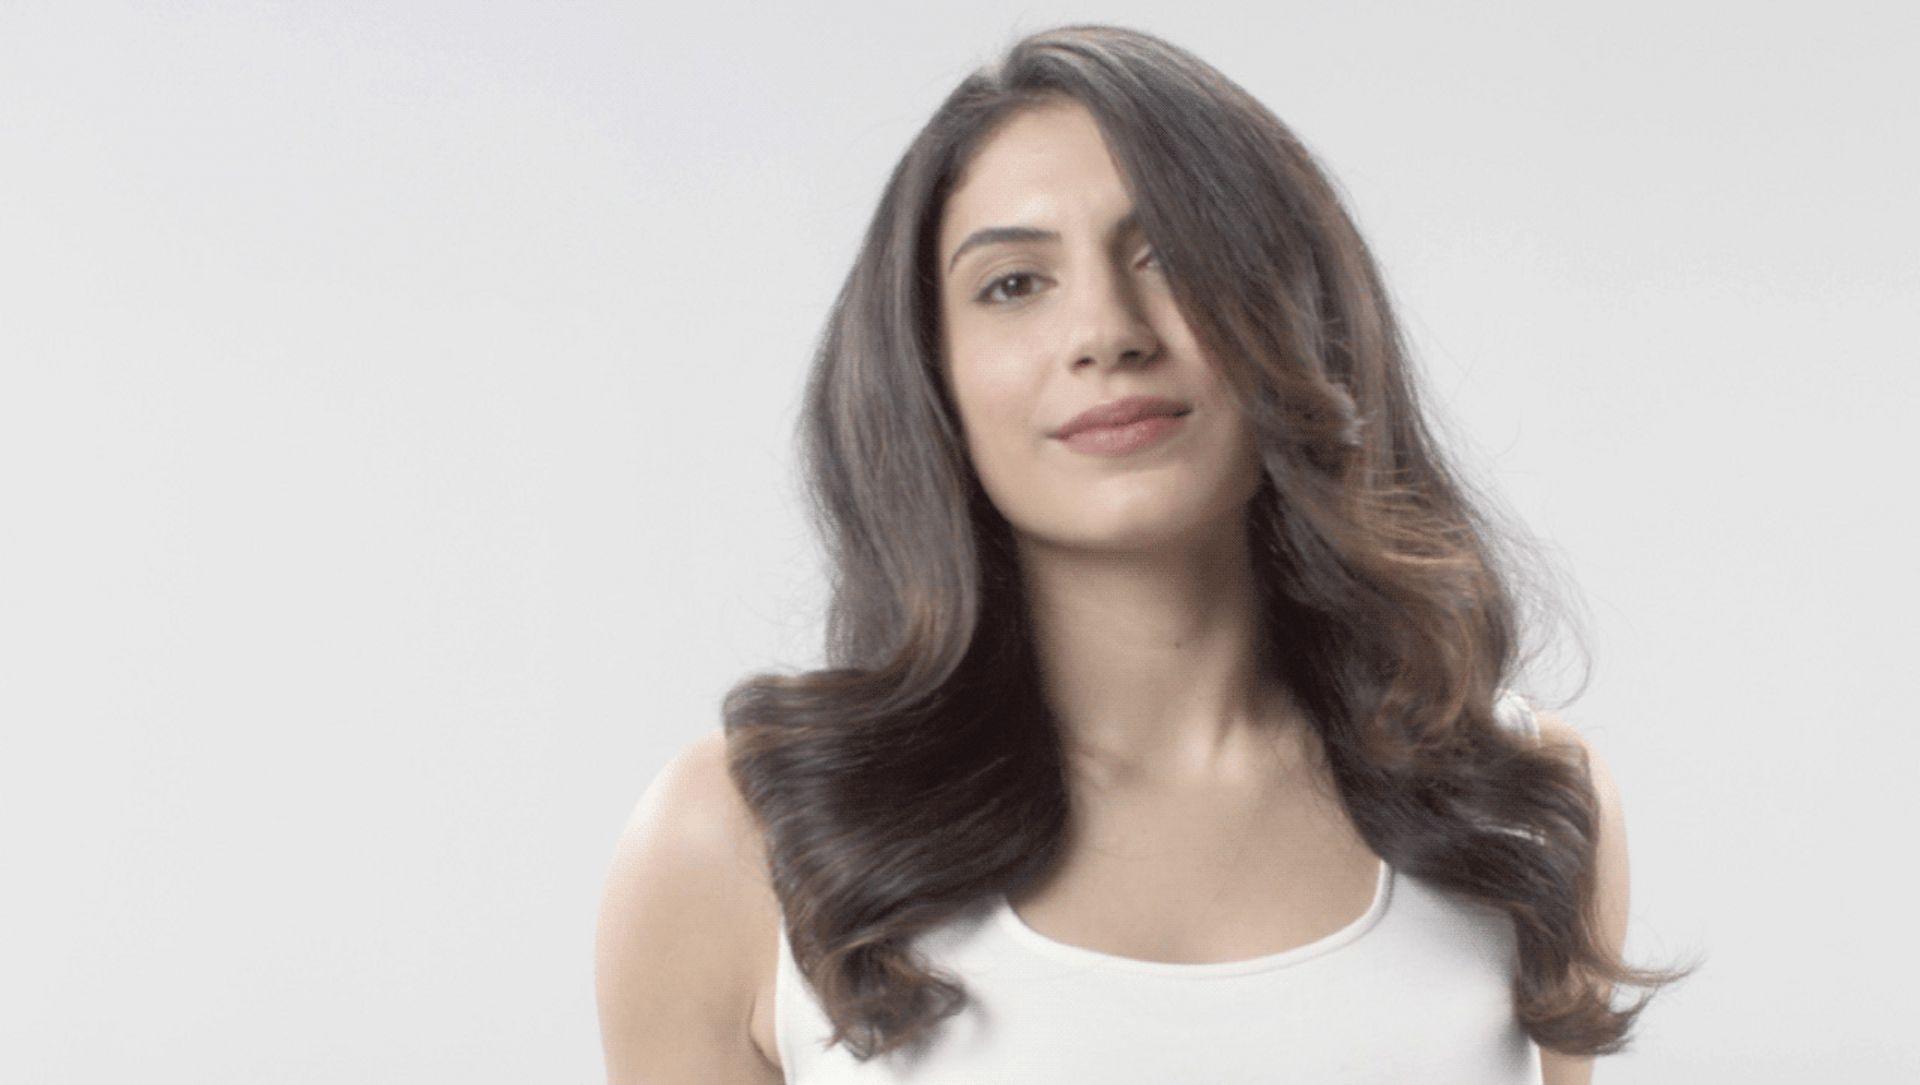 Lady with dark, voluminous hair.